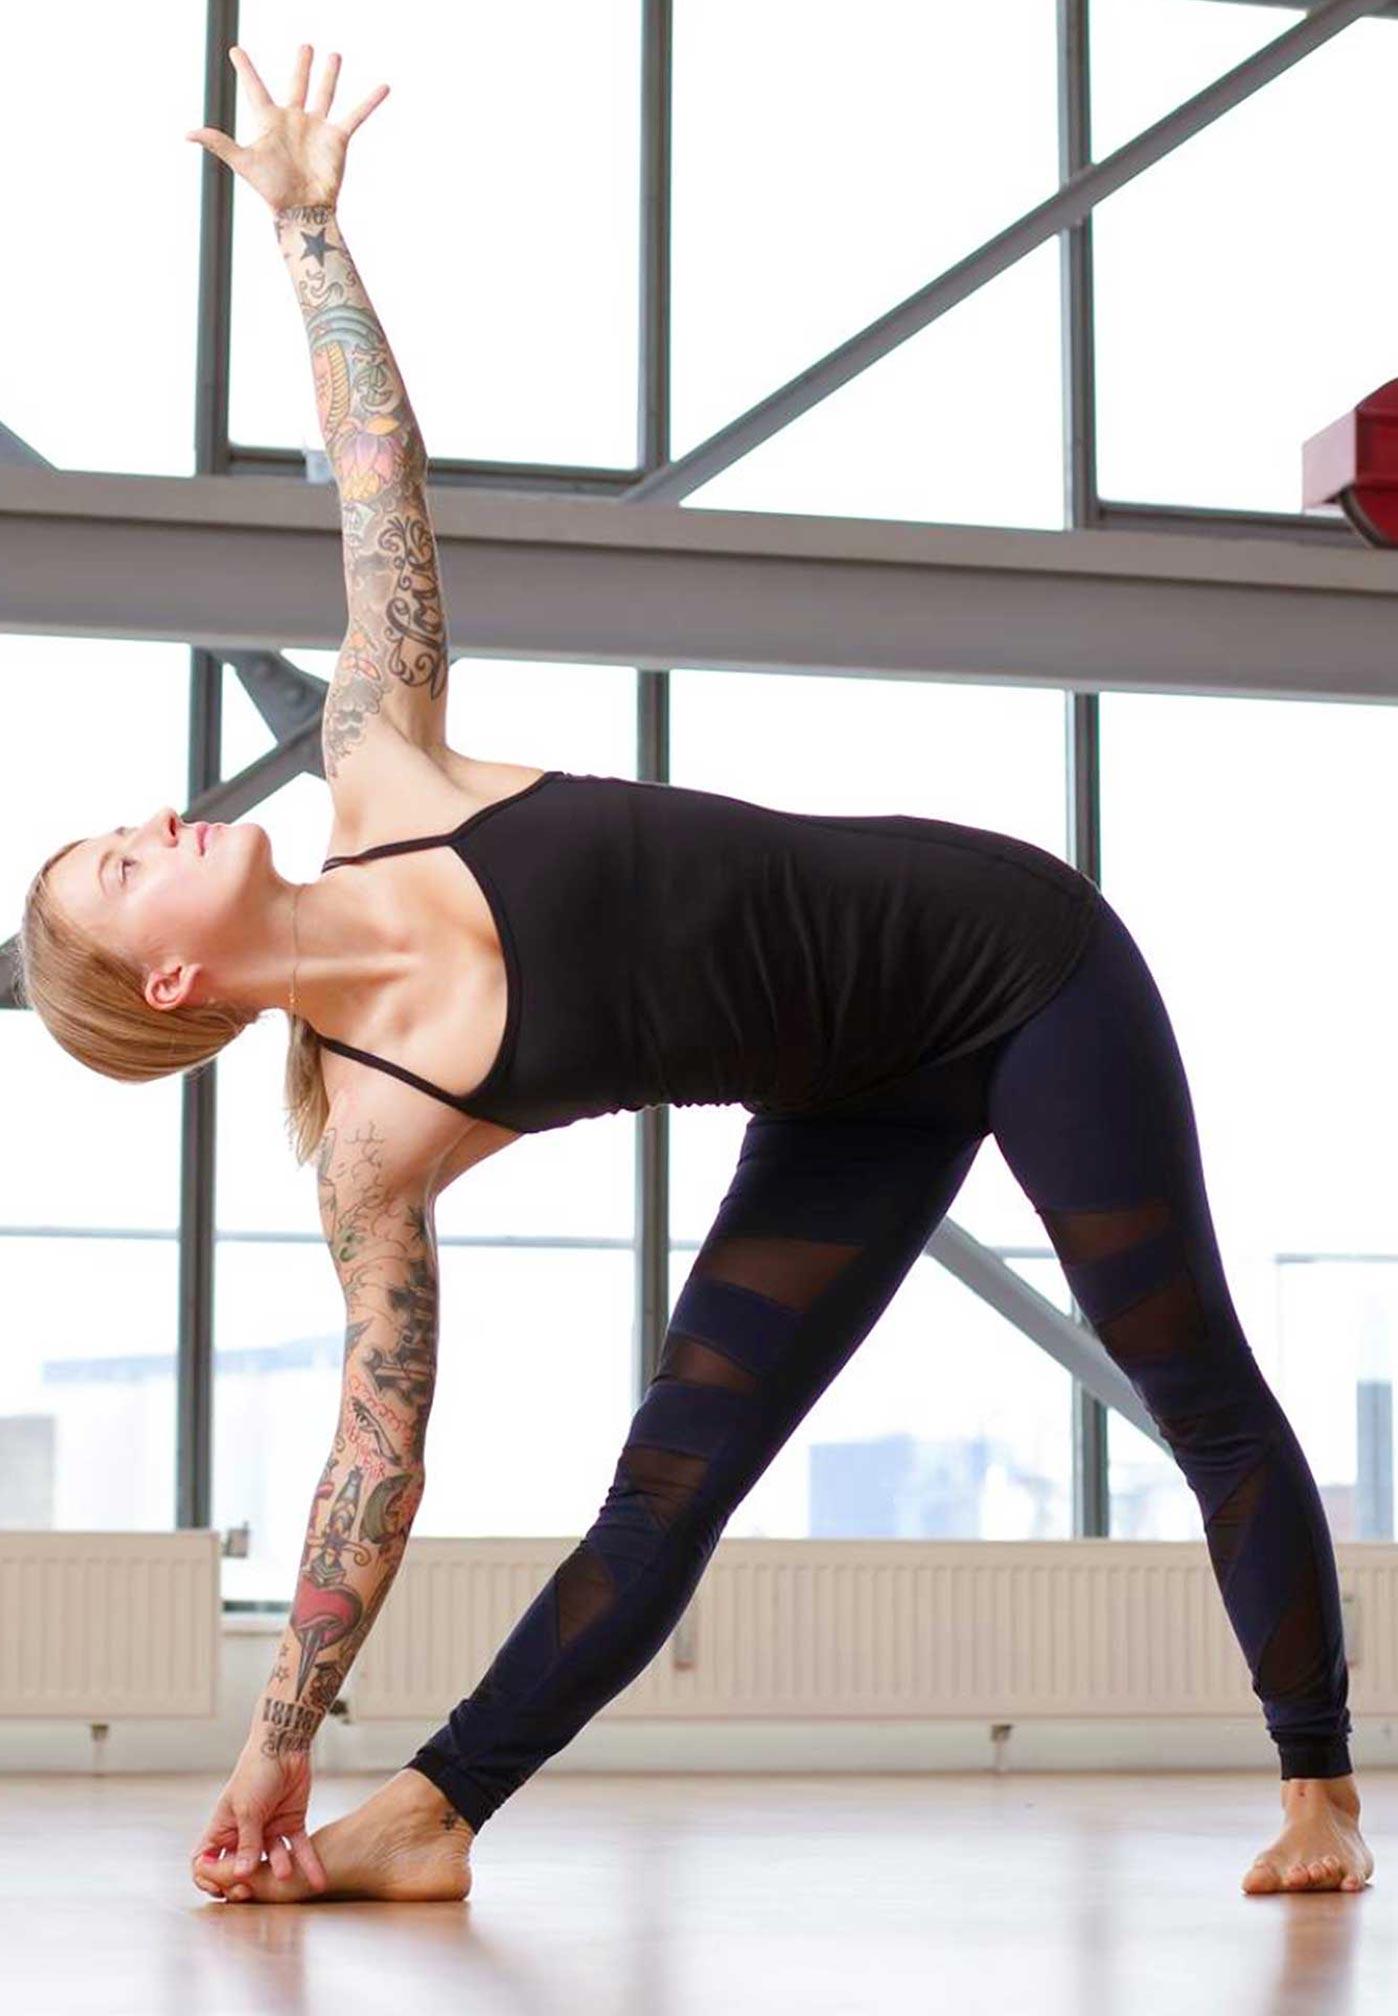 Jelena Lieberberg in Yoga Pose